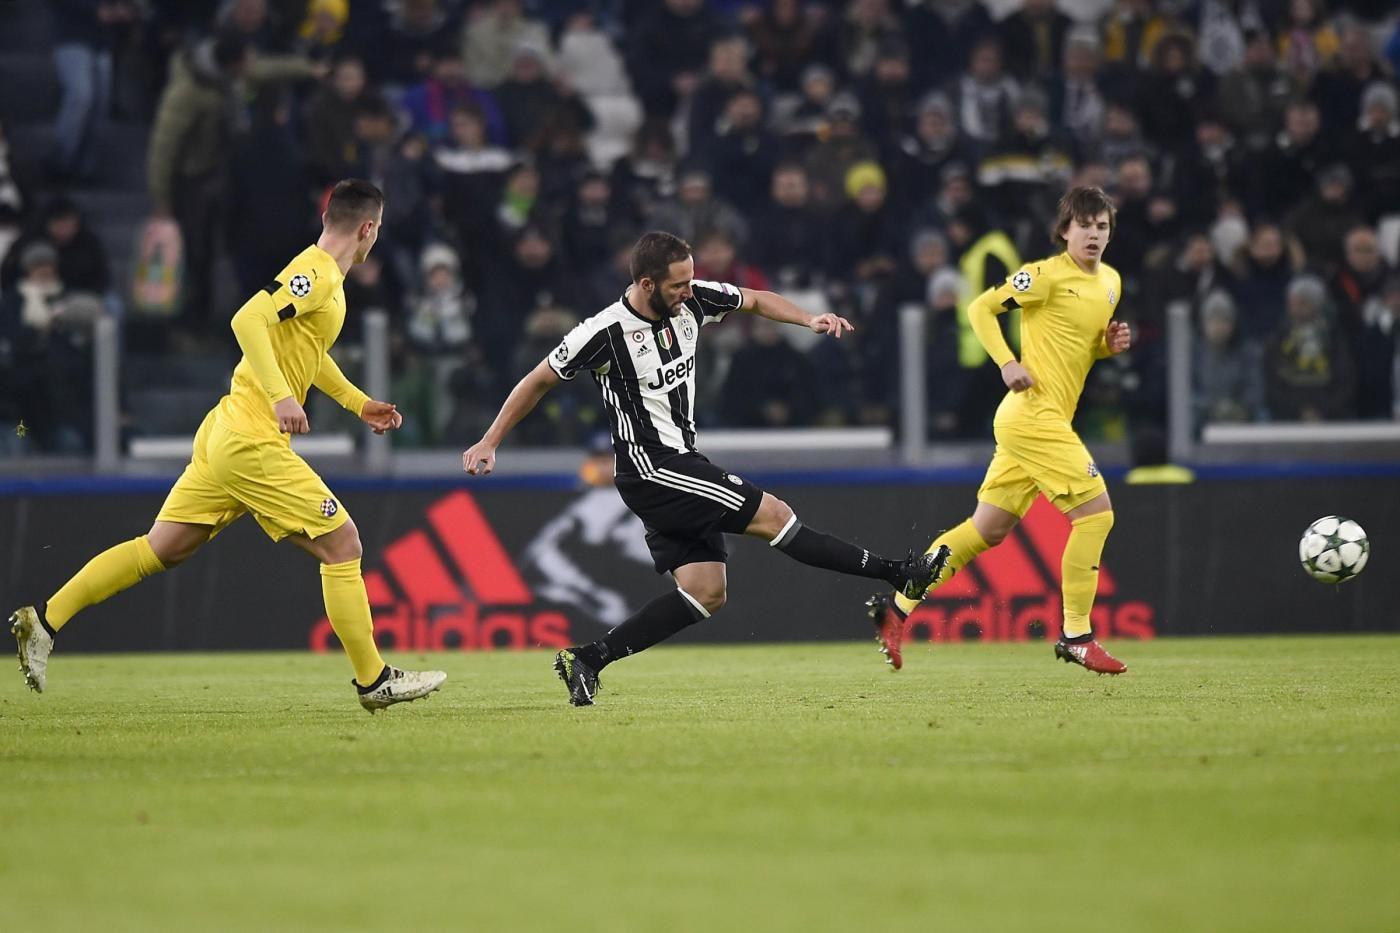 Champions: la Juve chiude prima il gruppo H - Sportmediaset - Sportmediaset - Foto 23